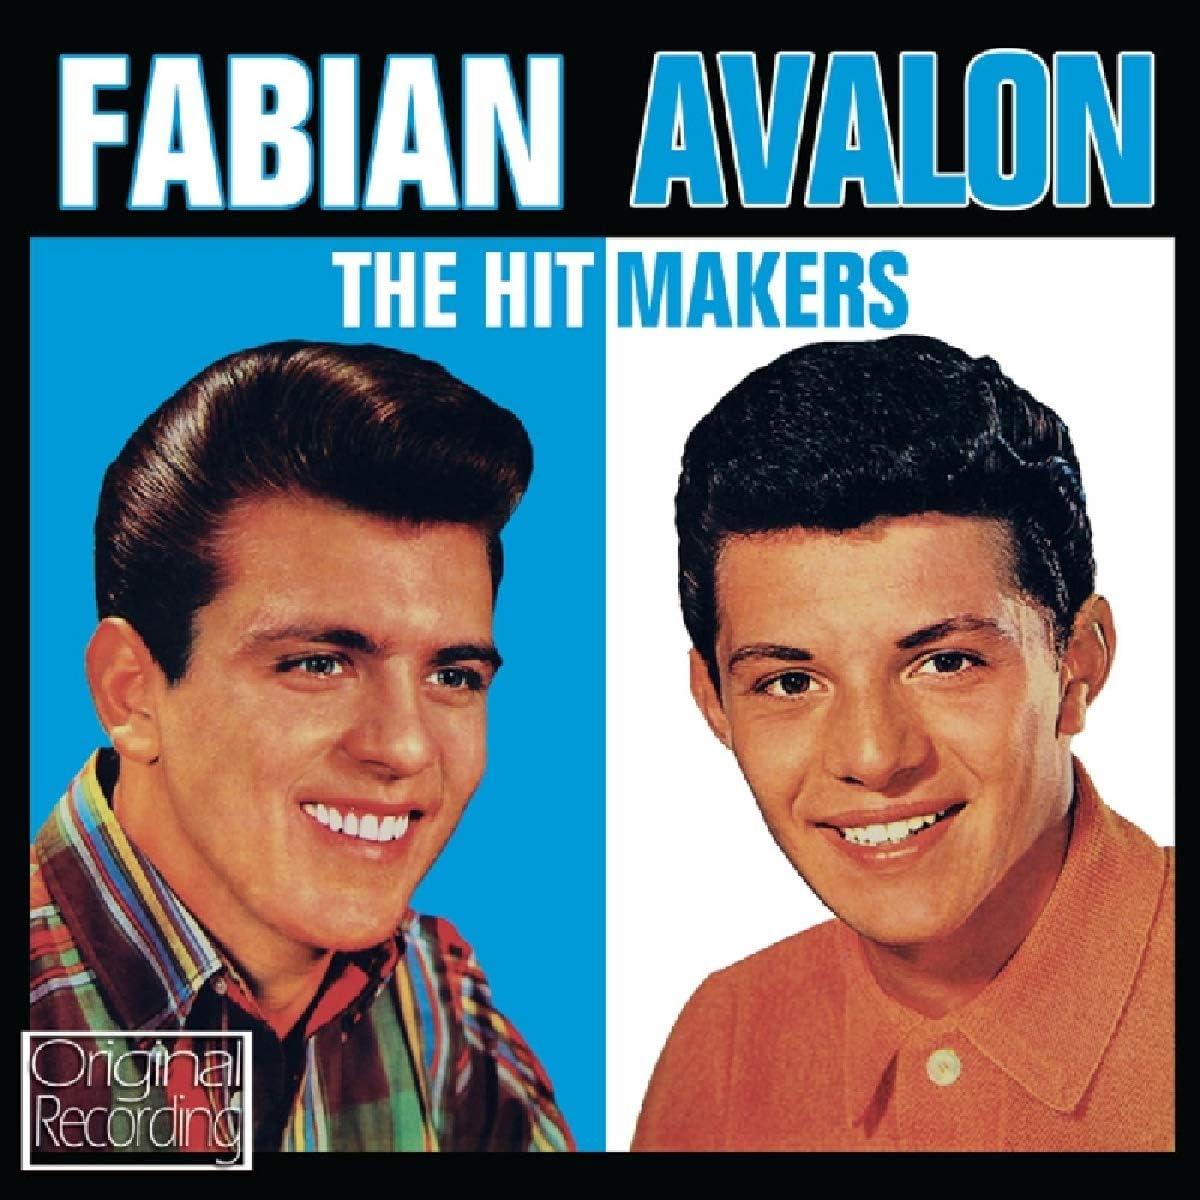 Amazon | Fabian Avalon-Hit Makers | Fabian, Avalon, Frankie | 輸入盤 | 音楽